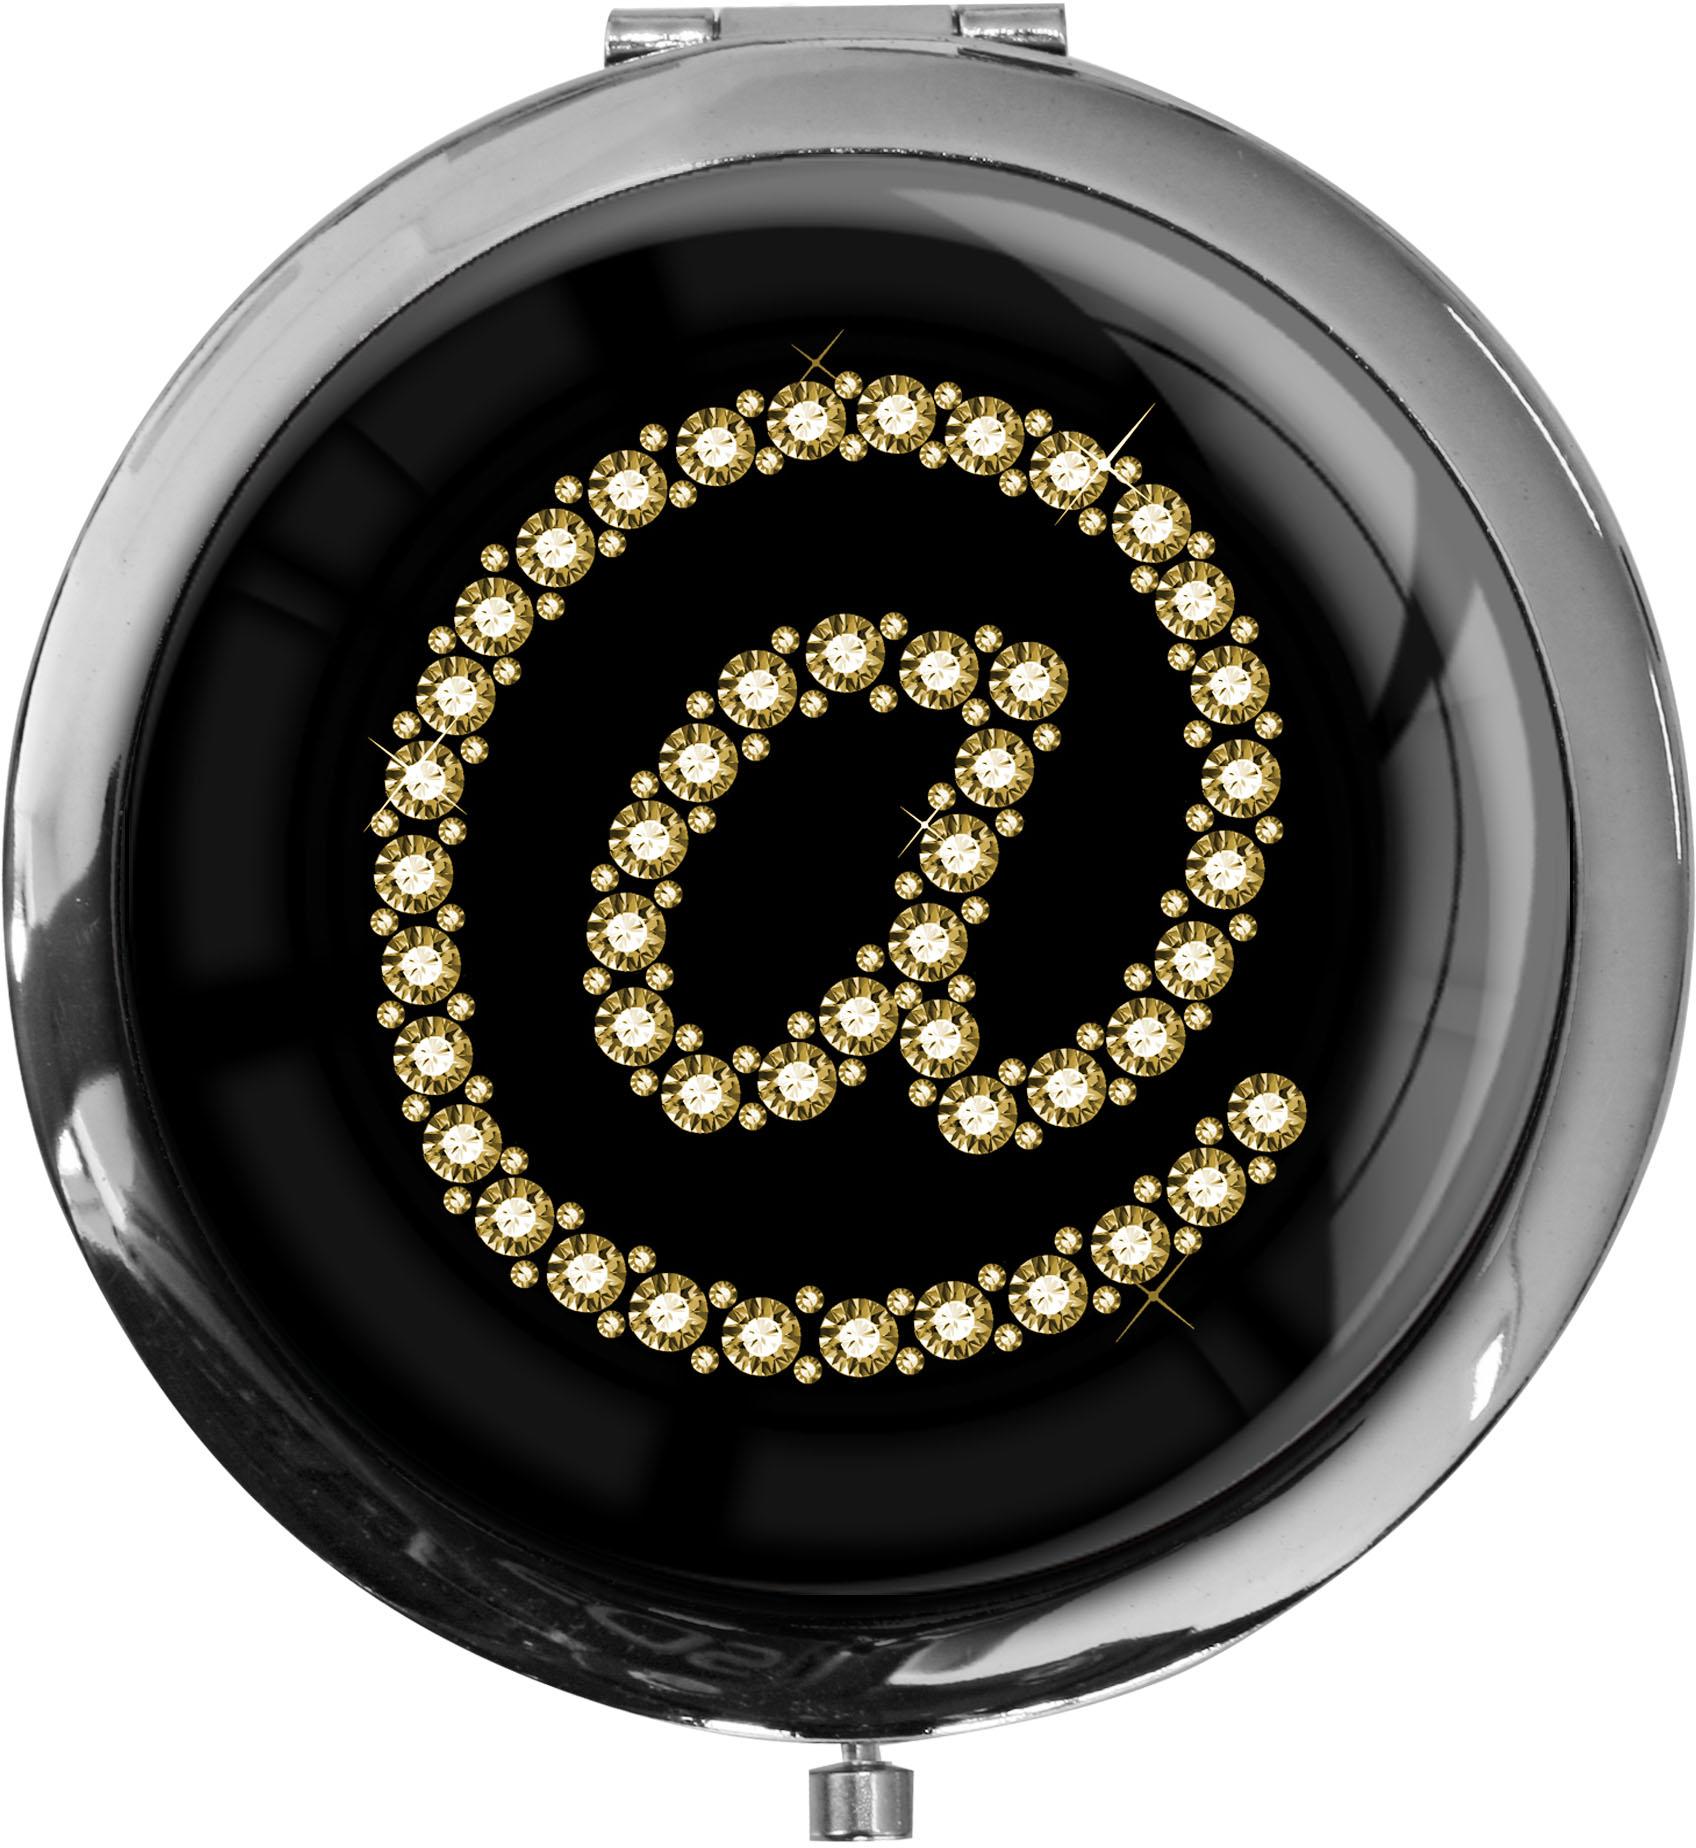 "metALUm - Extragroße Pillendose in runder Form ""At Symbol in Gold"""